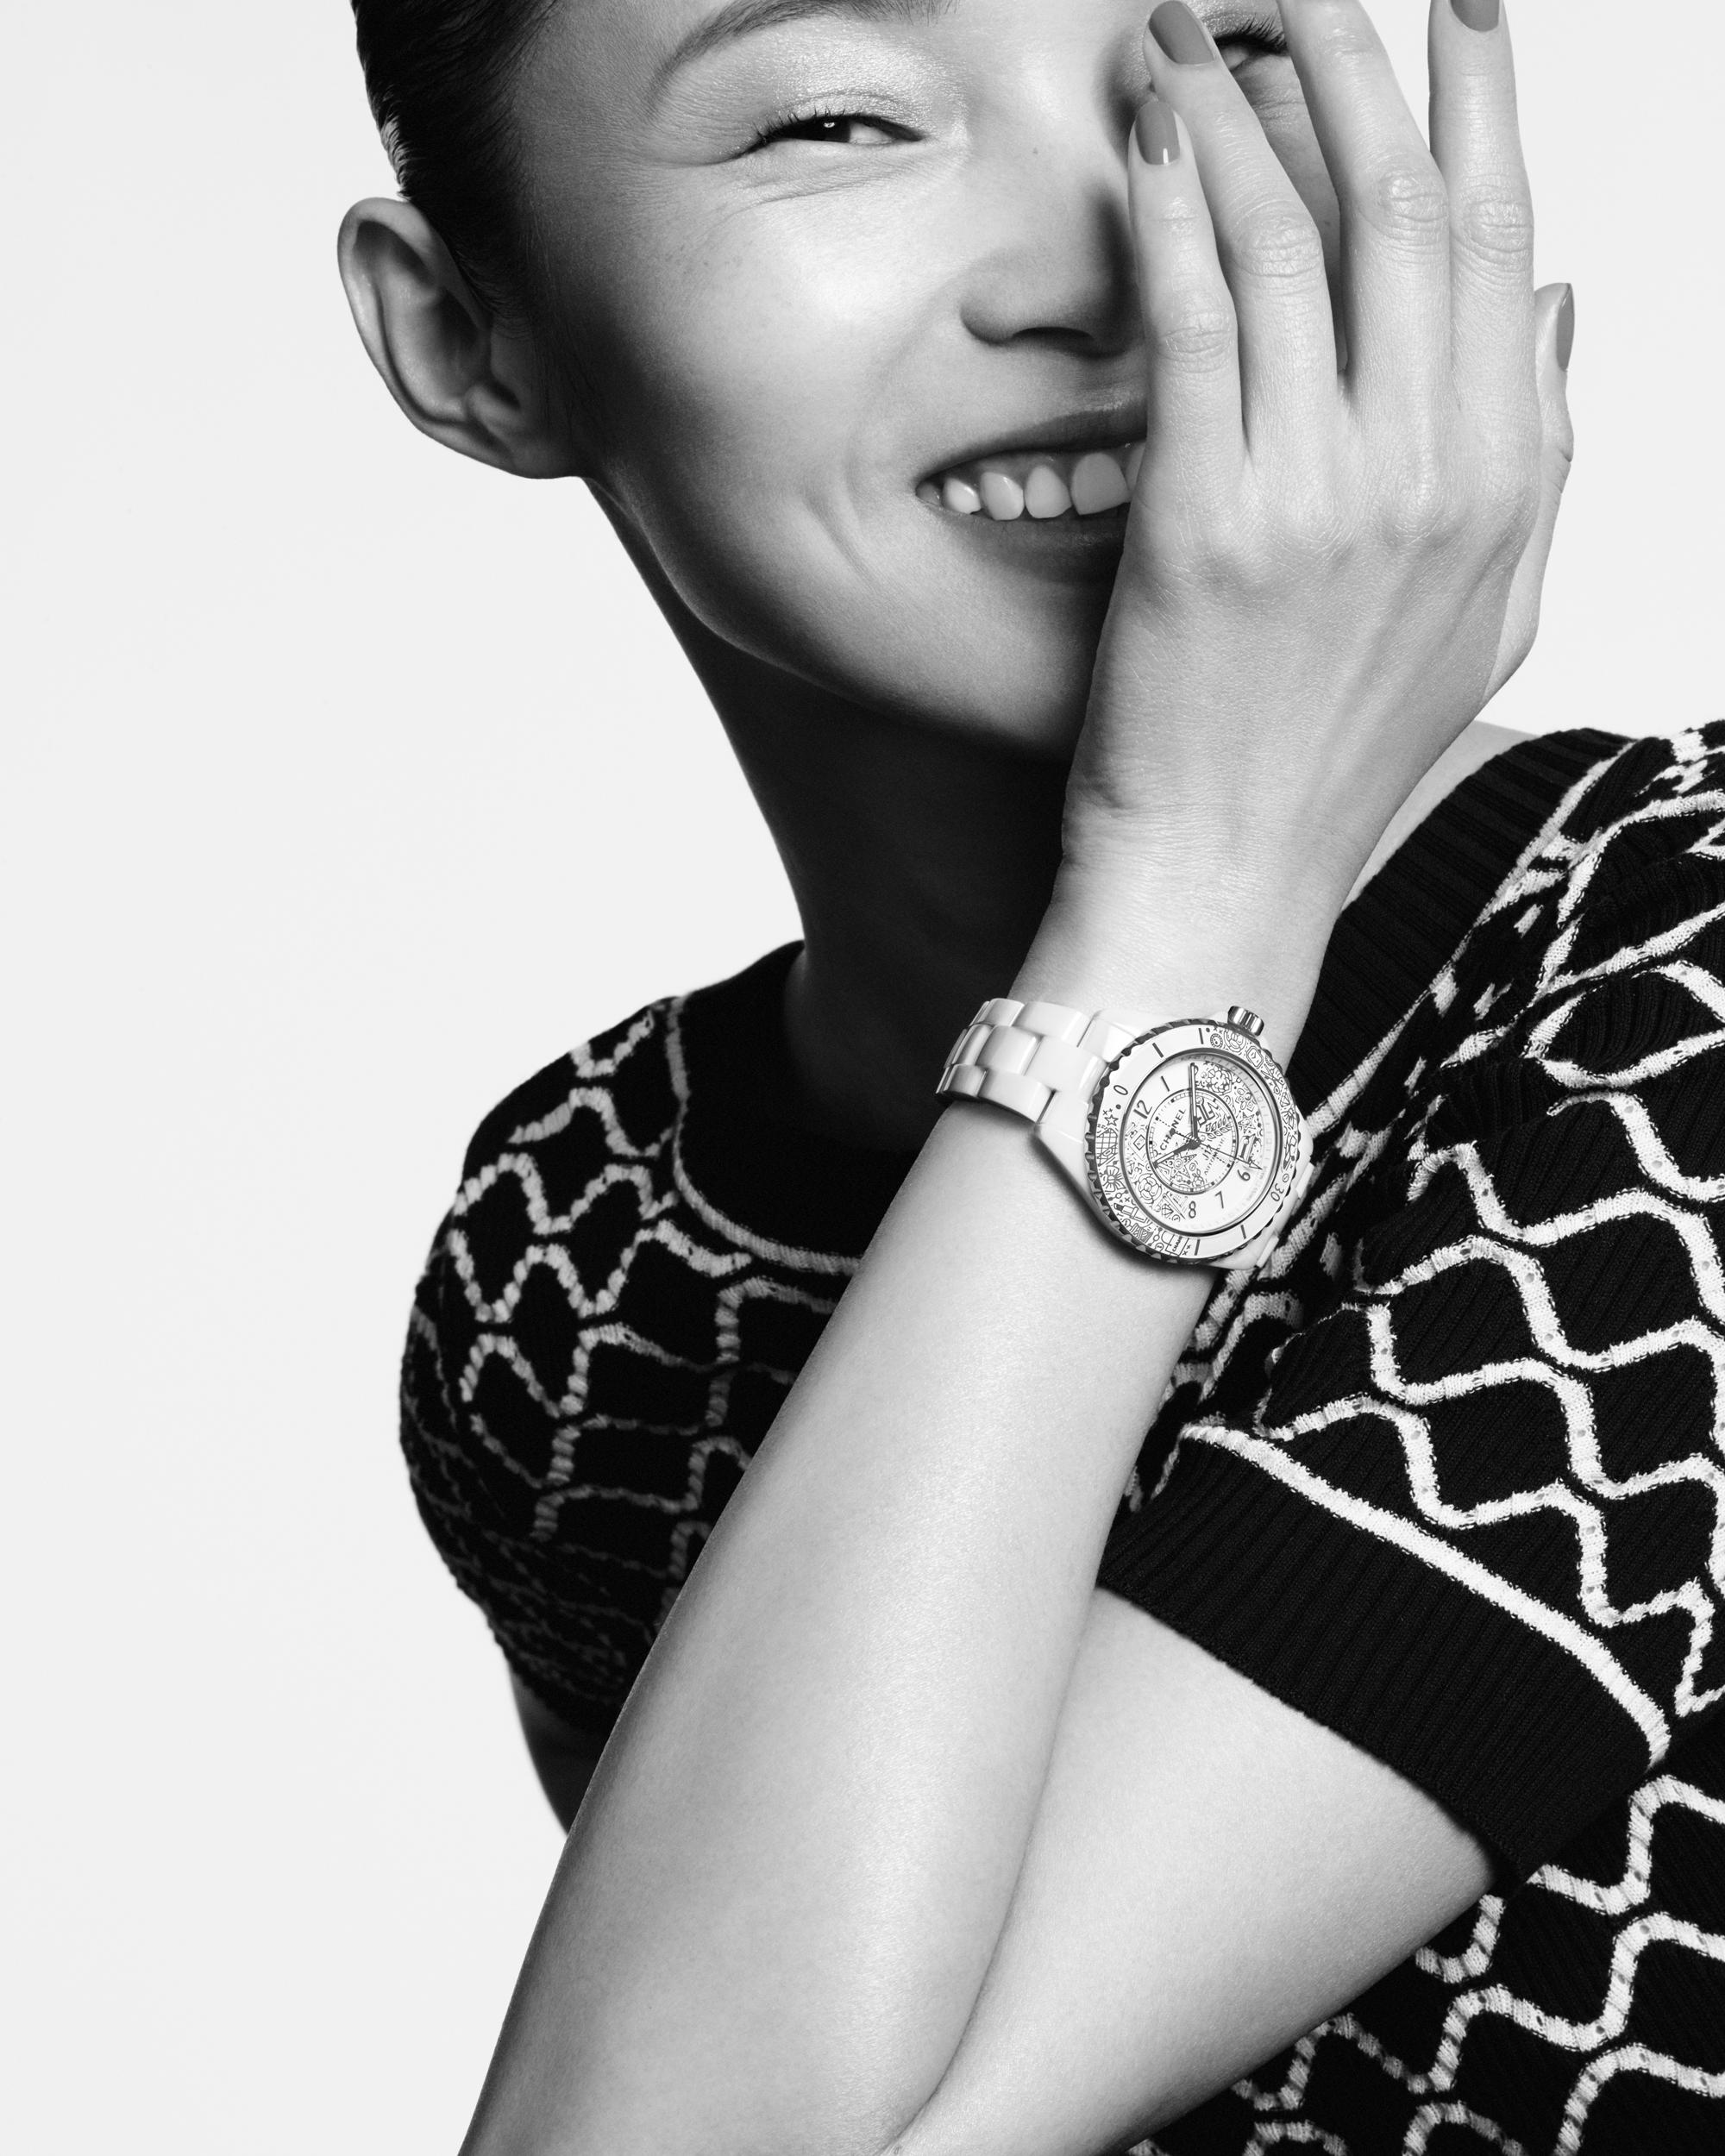 Chanel Summer 2020 Fashion Ad Campaign Photos